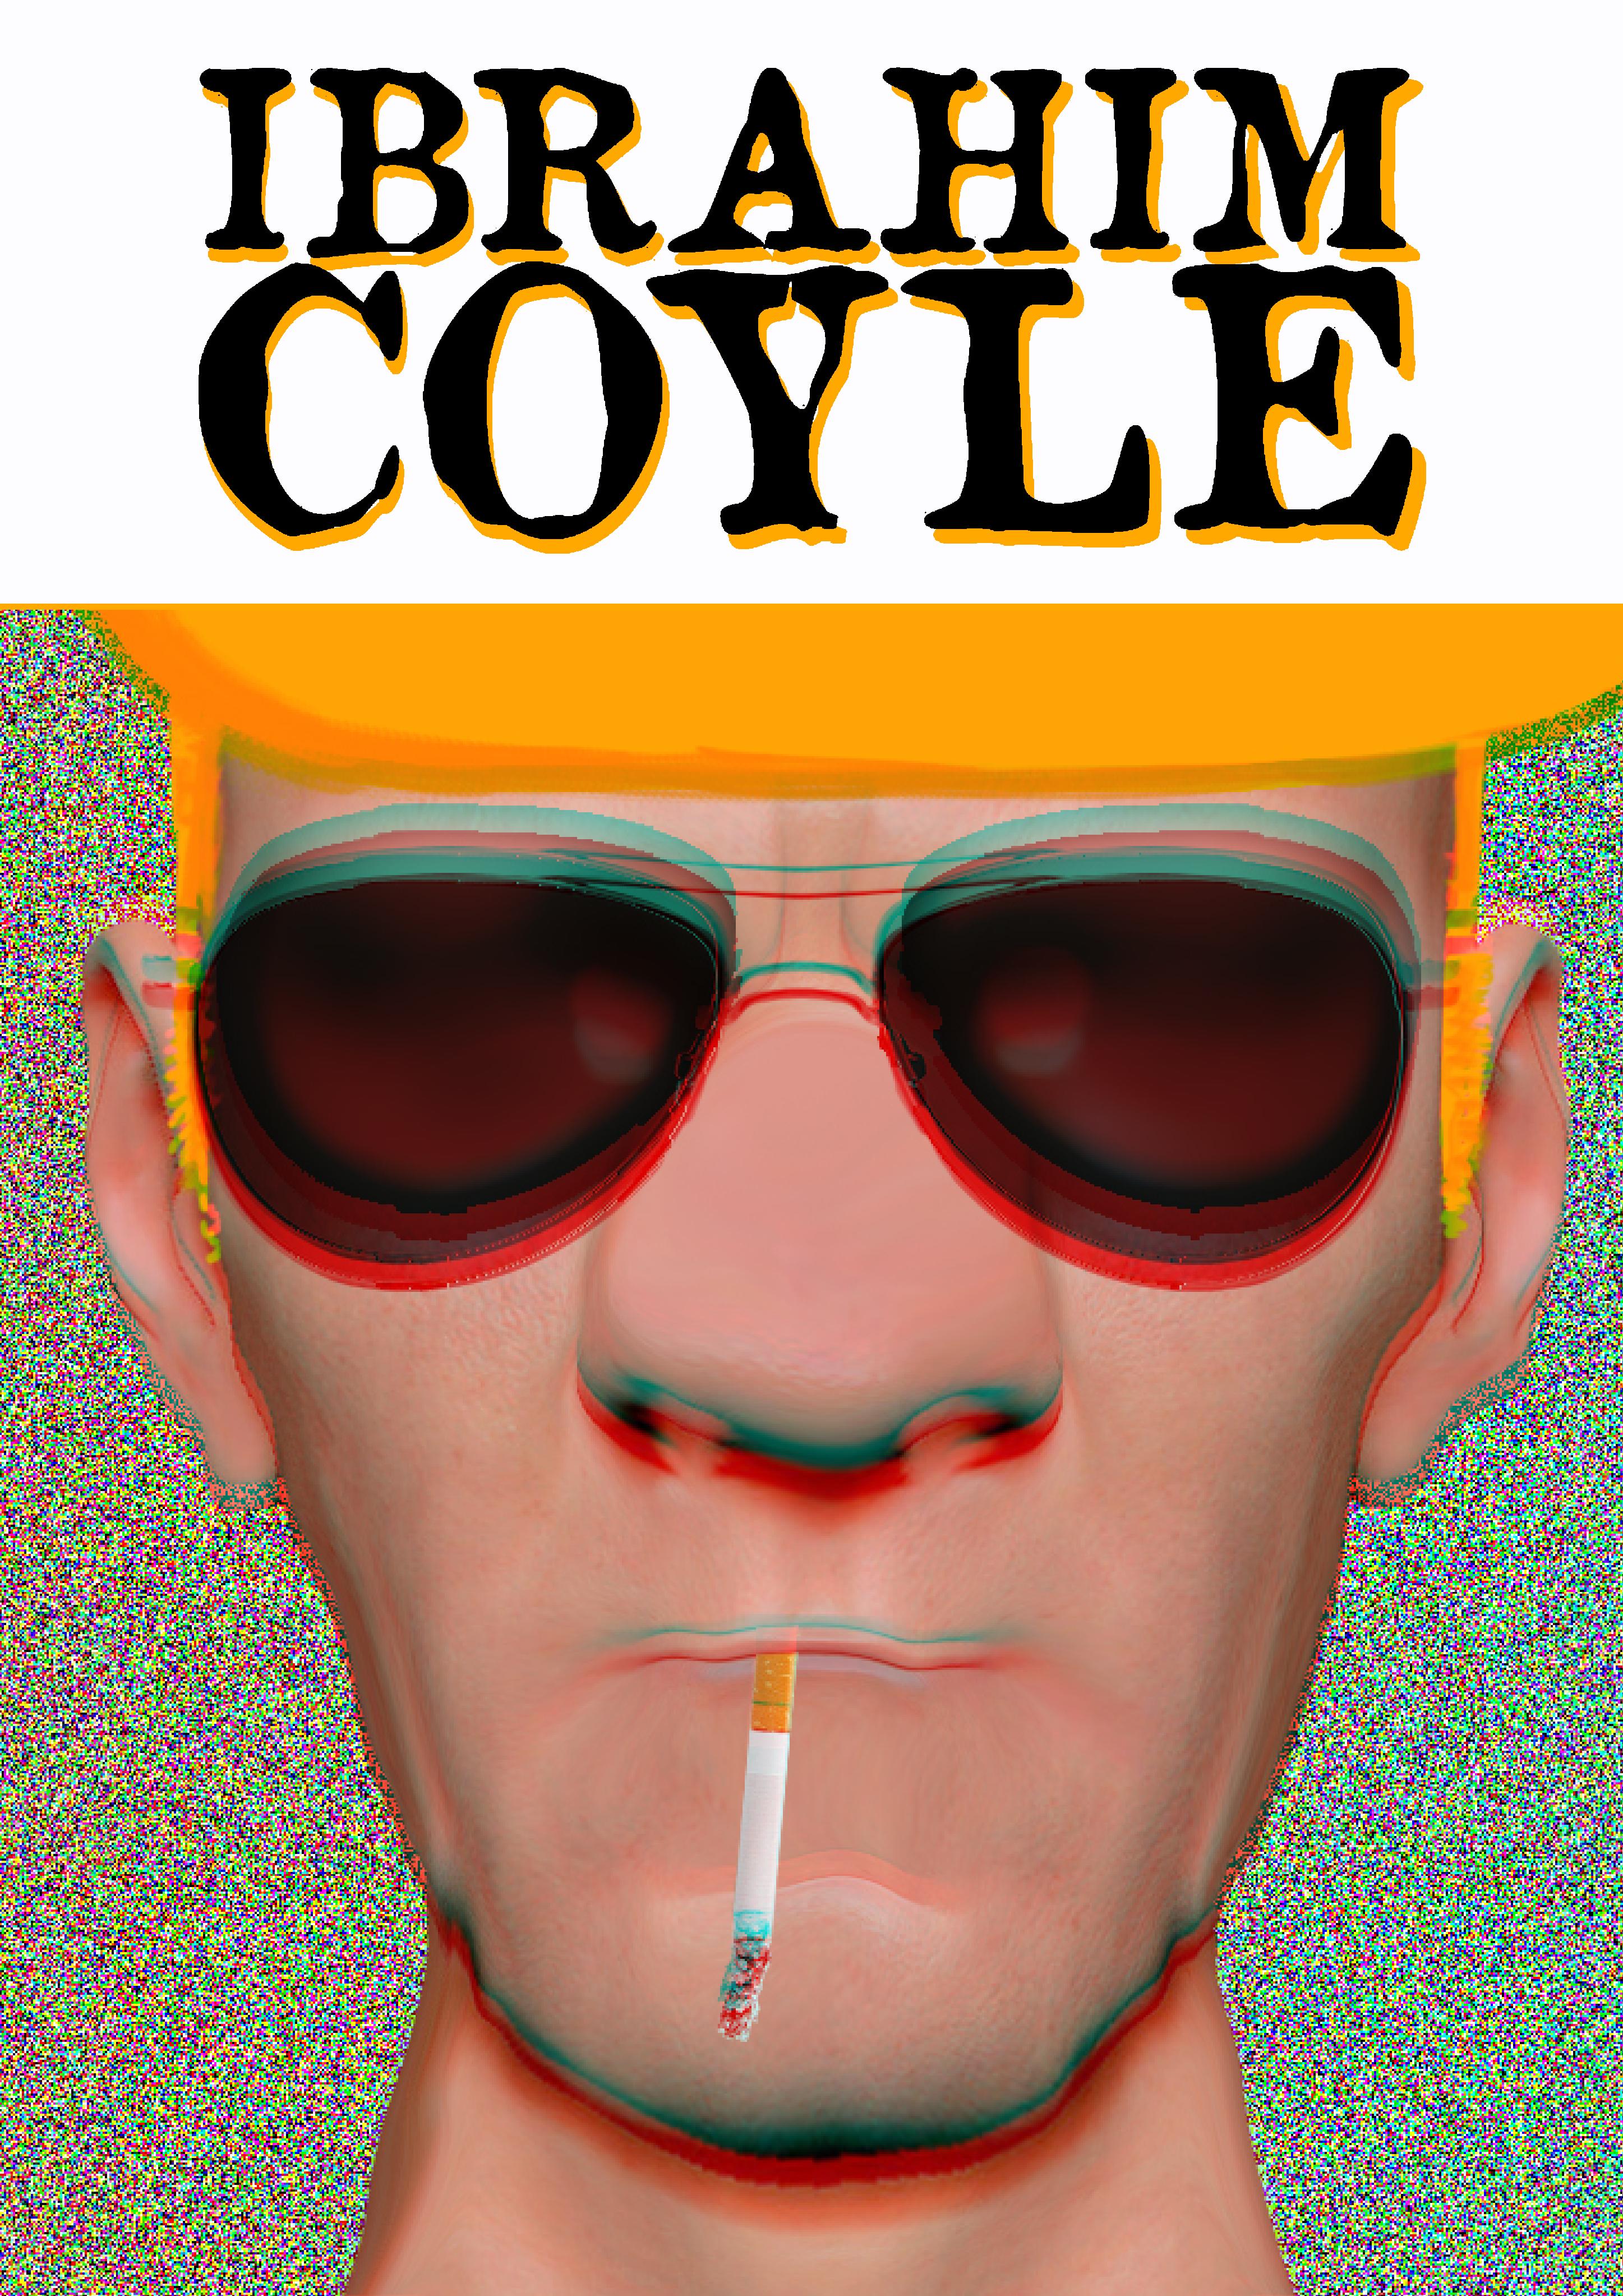 Ibrahim Coyle #16